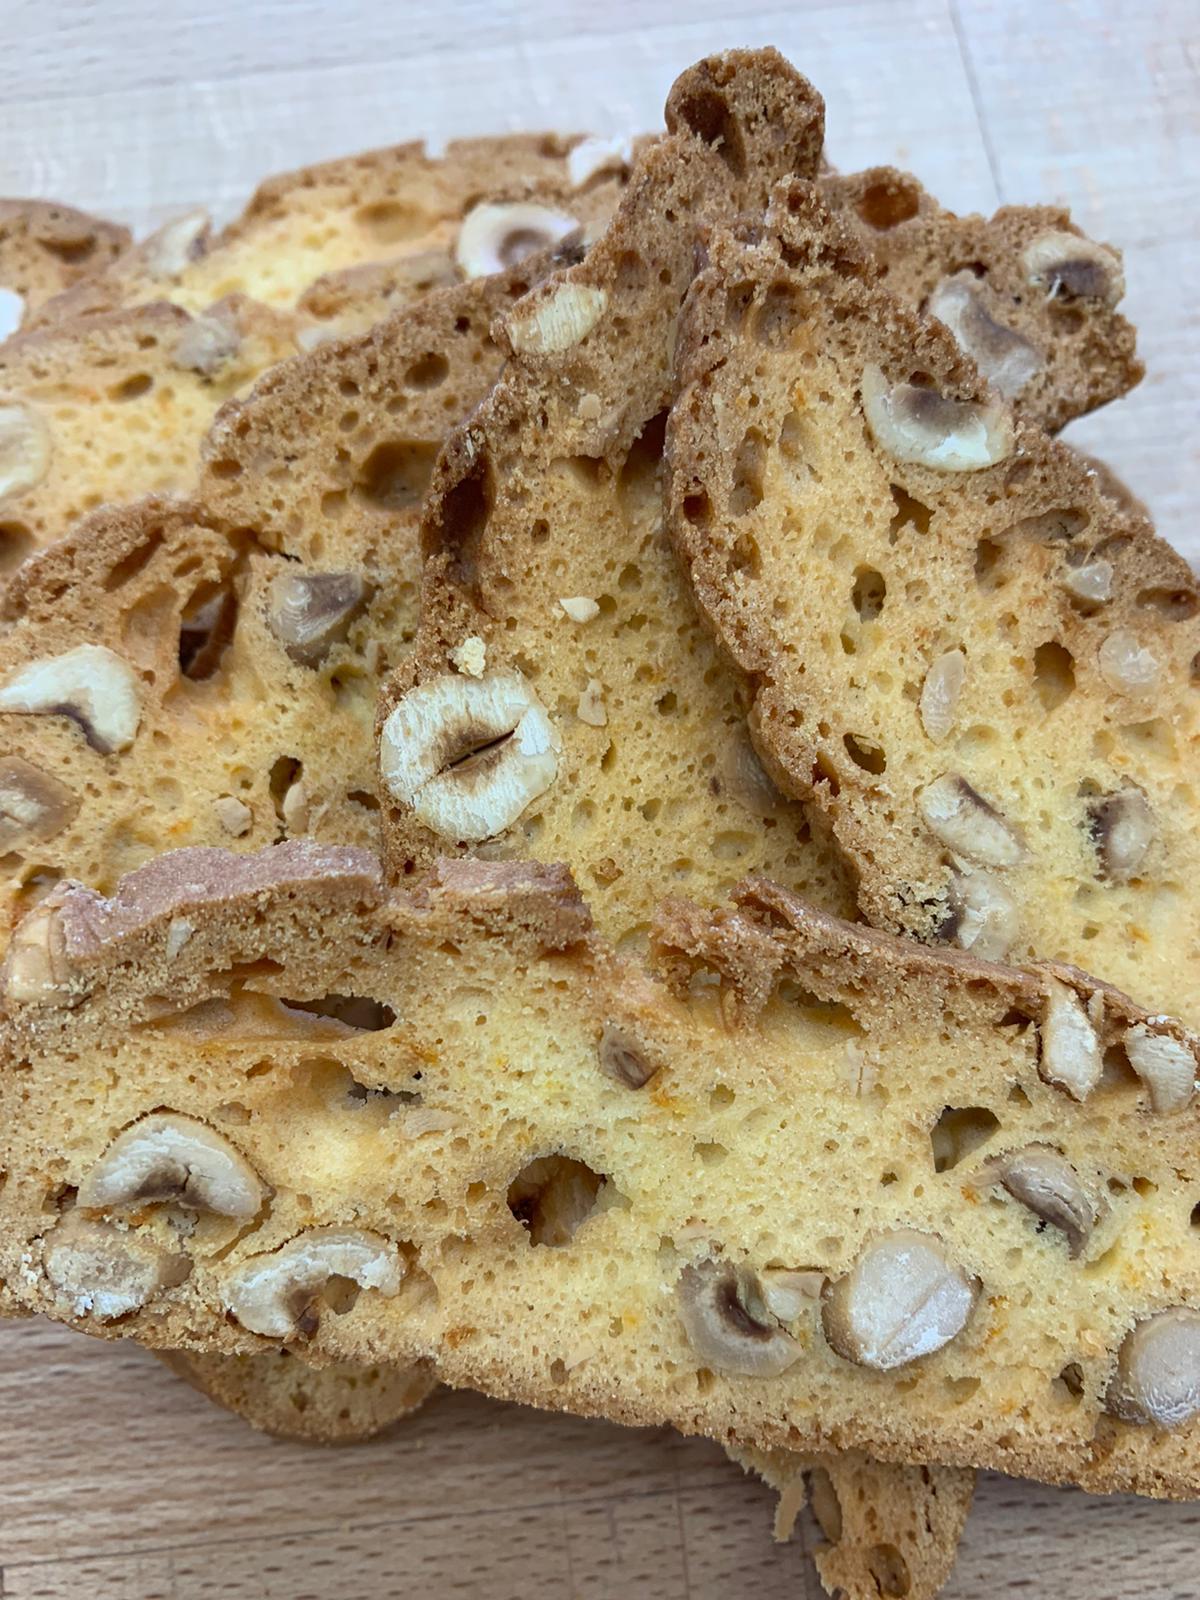 (FRI) Biscotti